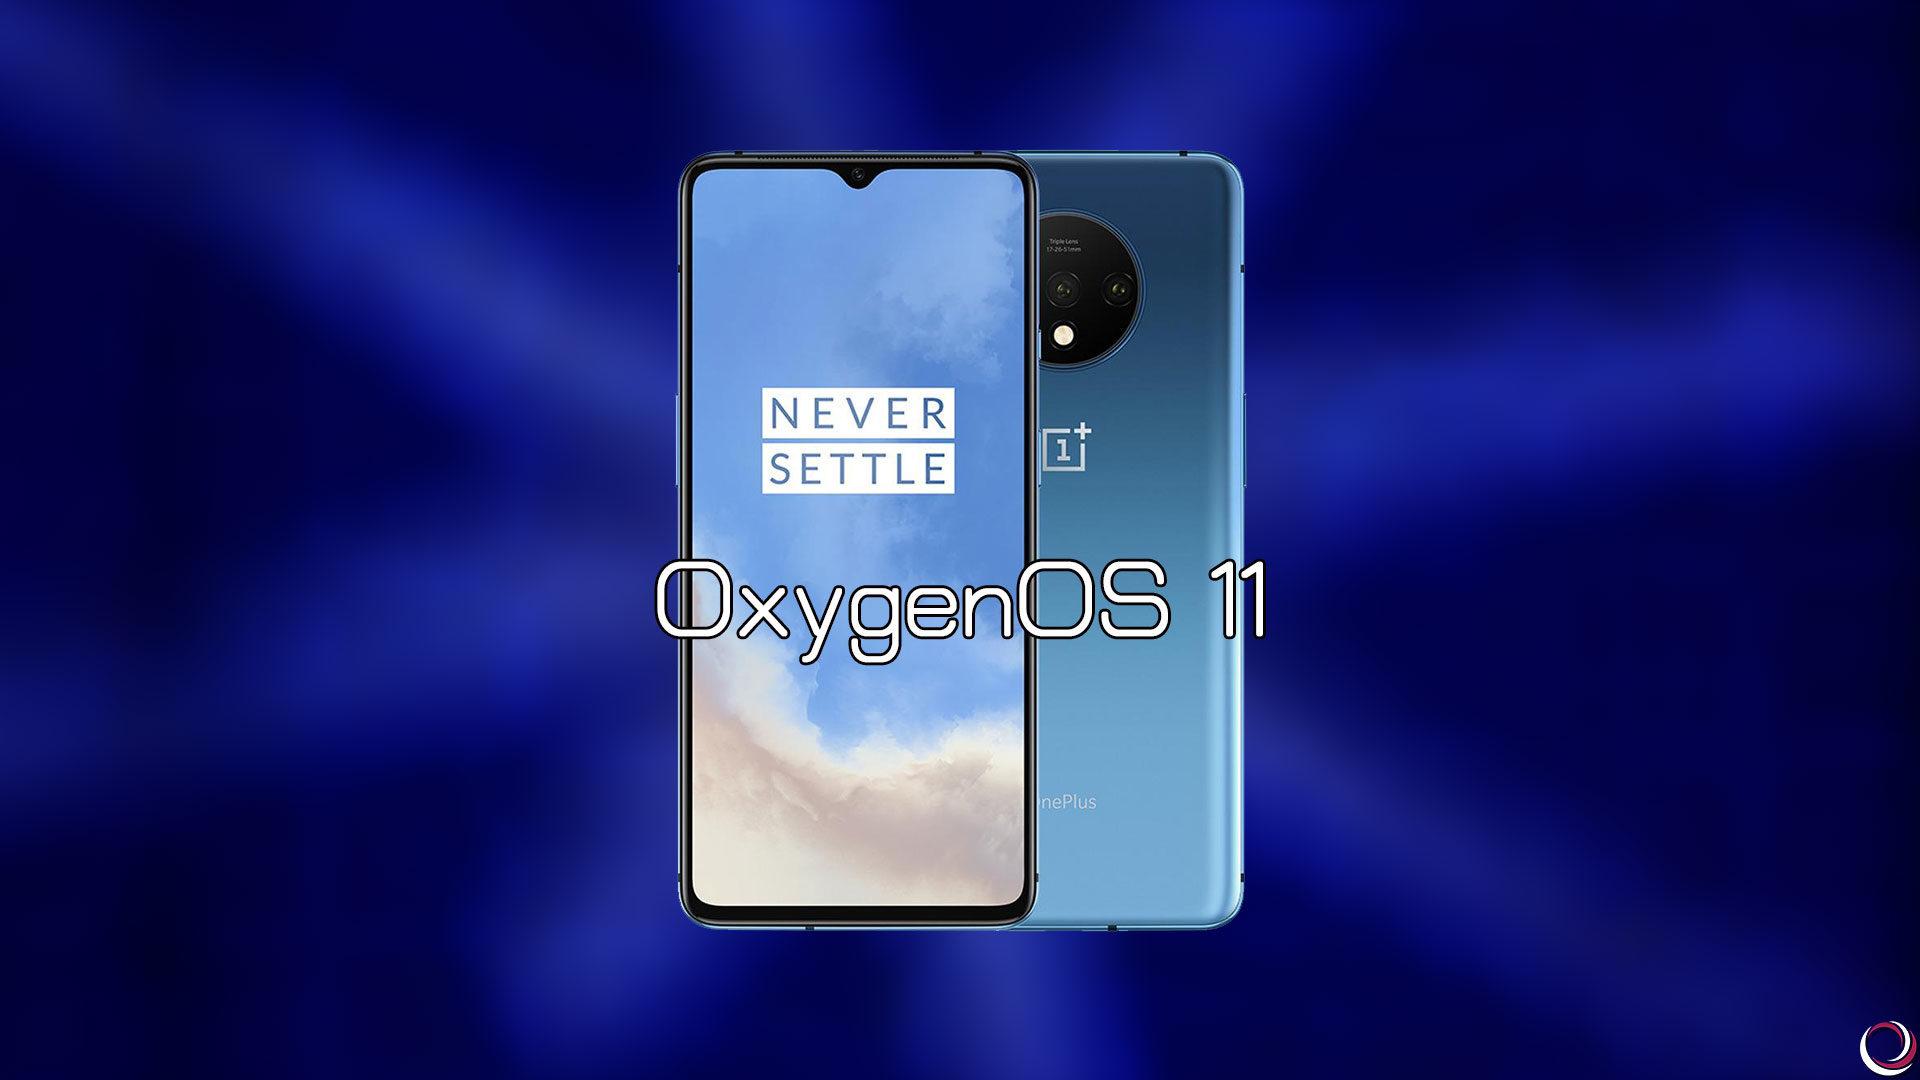 「OnePlus 7T/7T Pro」向けに「Android 11」ベースの安定版「OxygenOS 11」がリリース